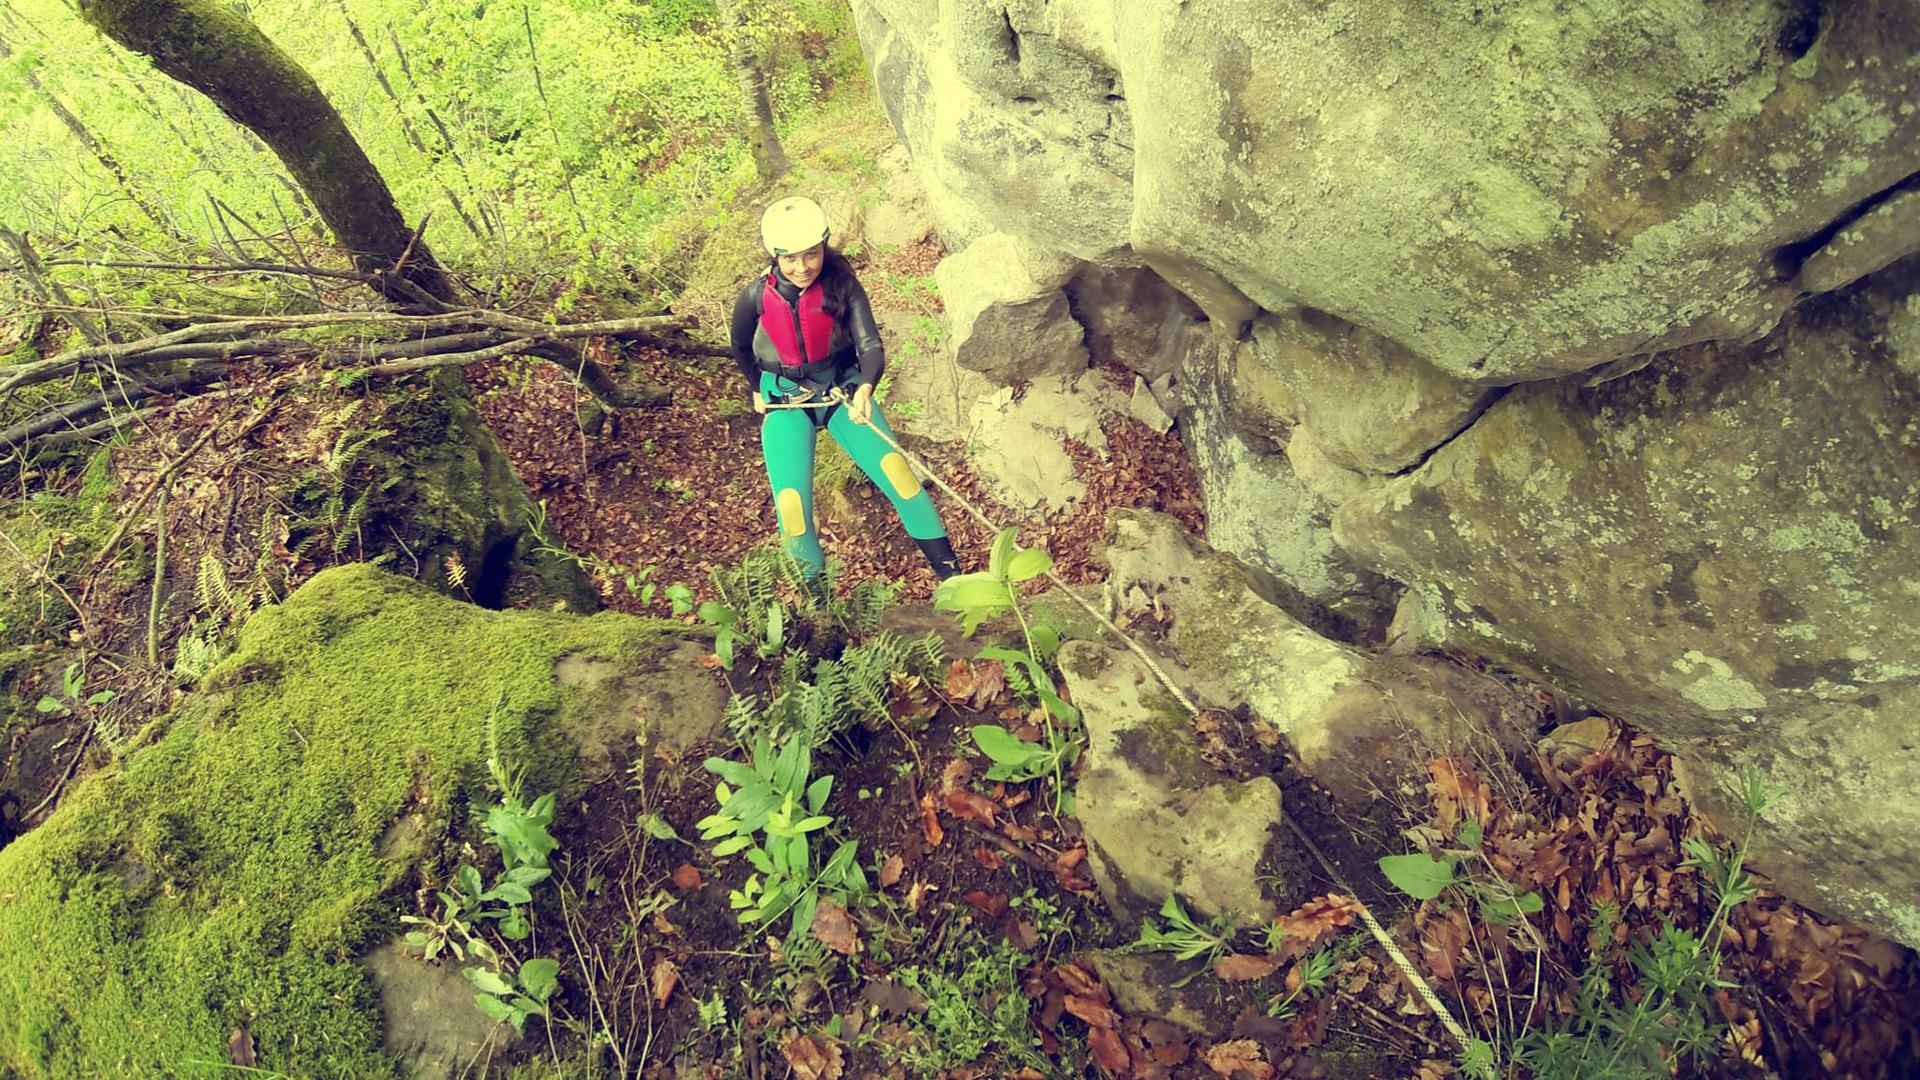 Action adventure Varna